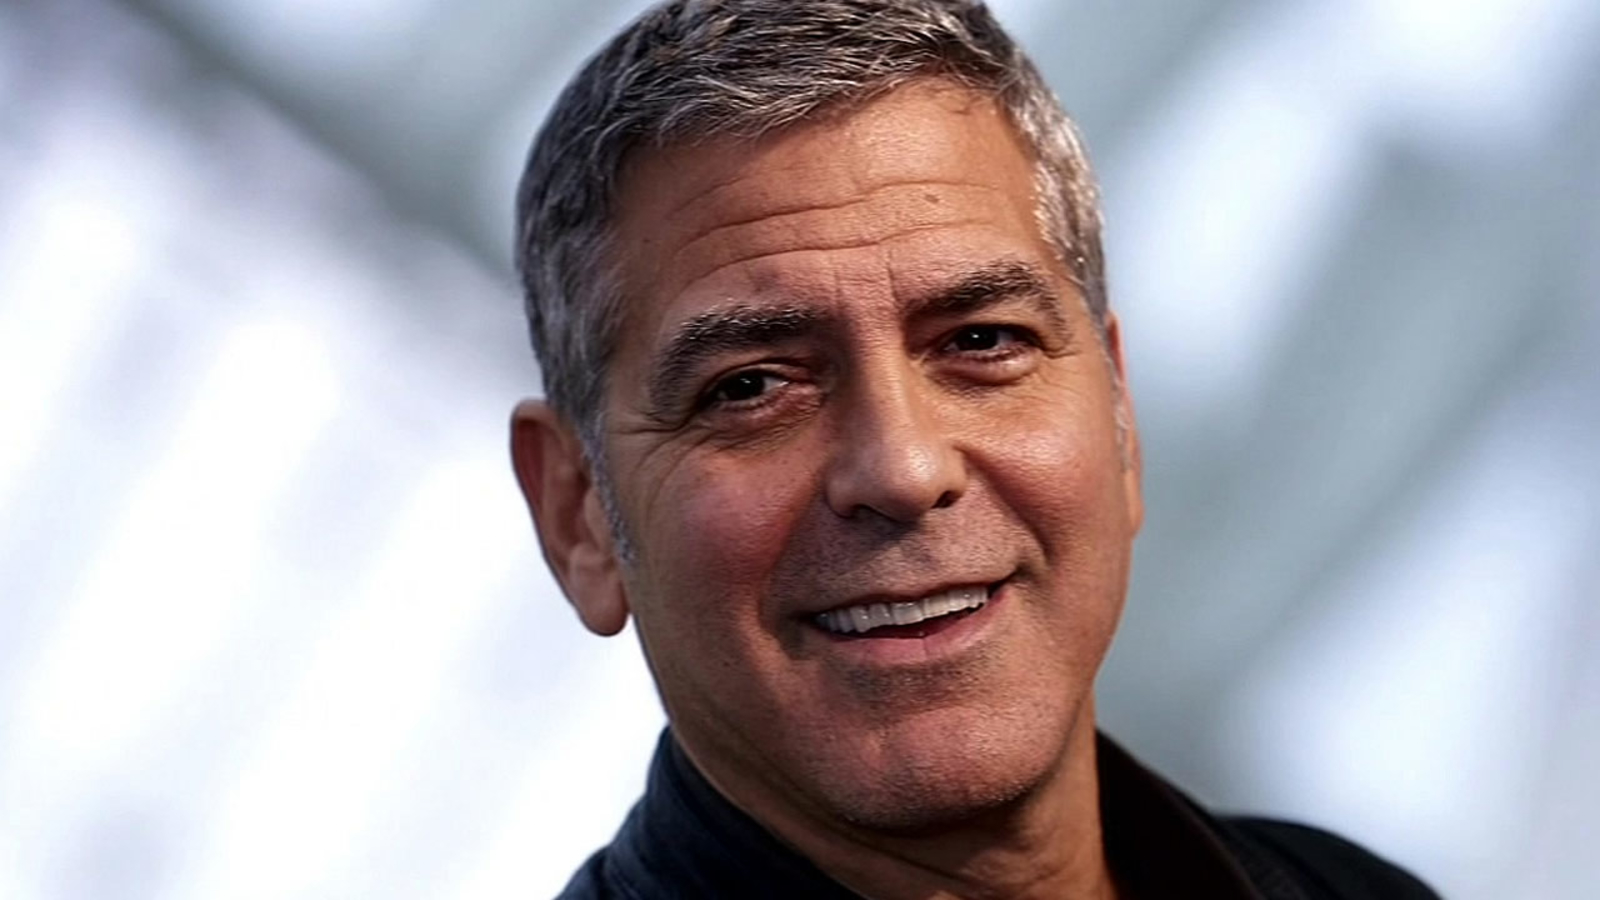 Actor George Clooney hurt in motorcycle crash in Italy report 1600x900